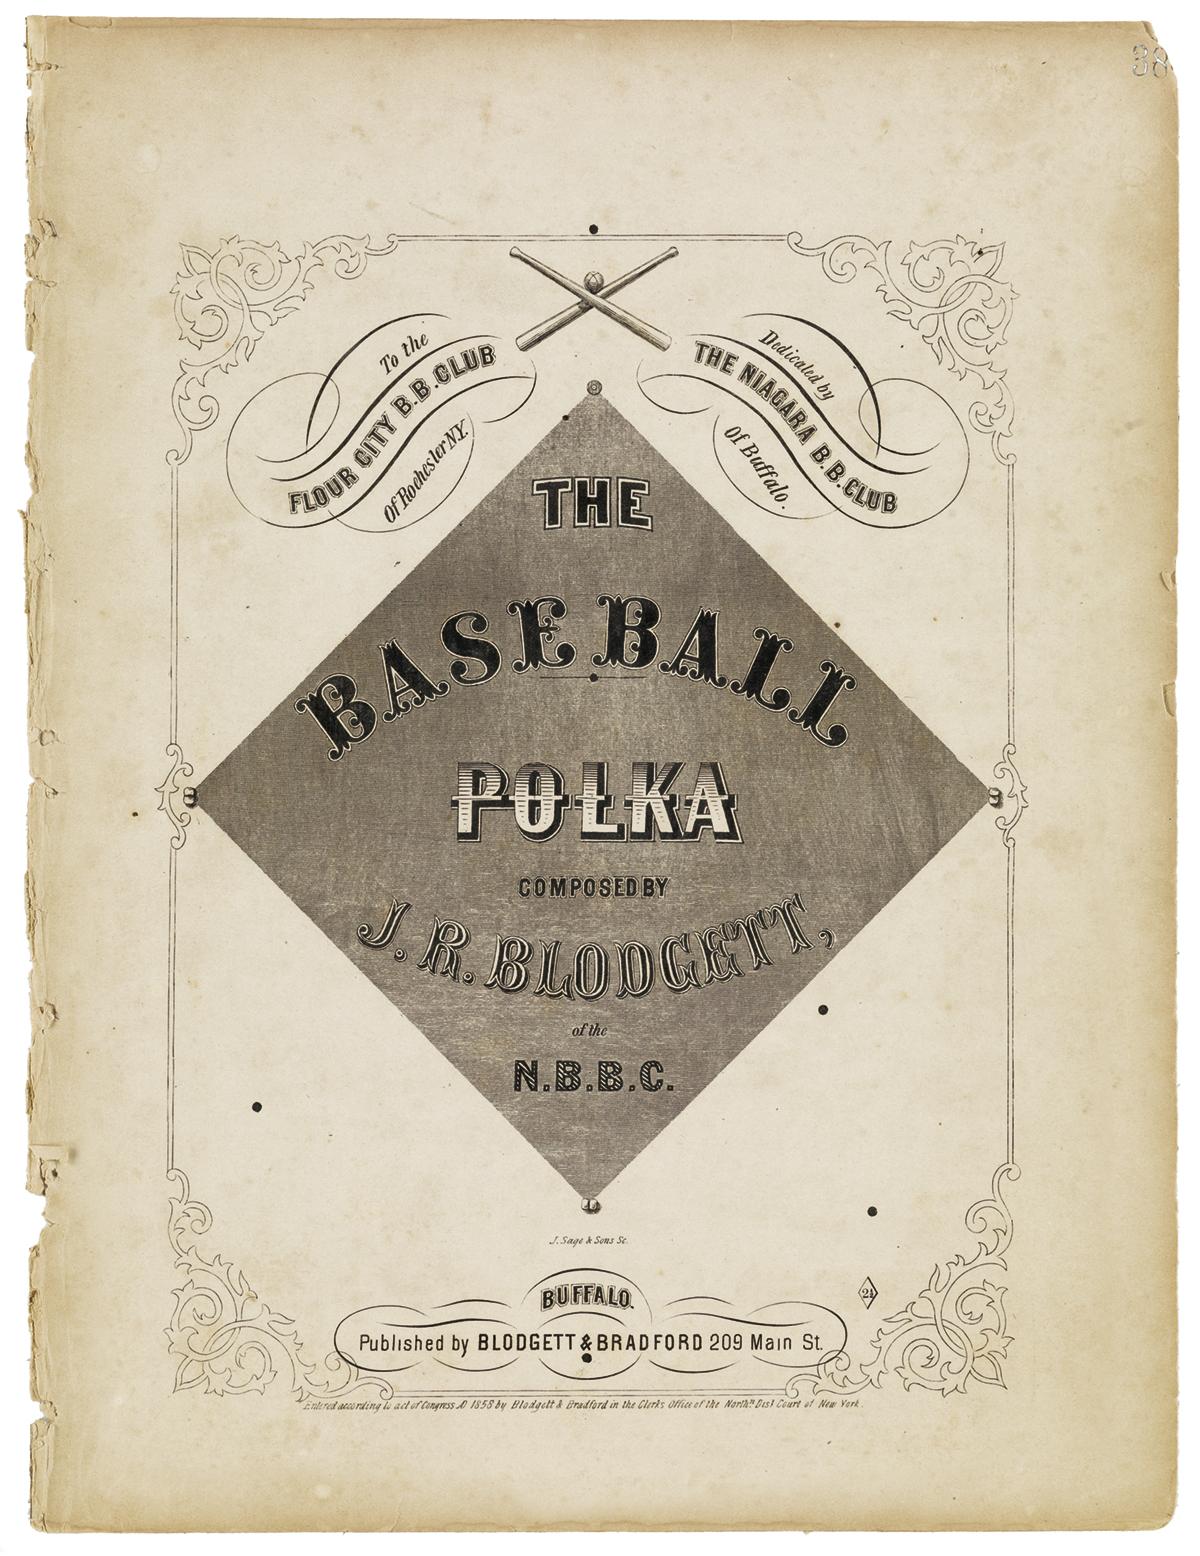 (SPORTS--BASEBALL.) Blodgett, J.R. The Baseball Polka.